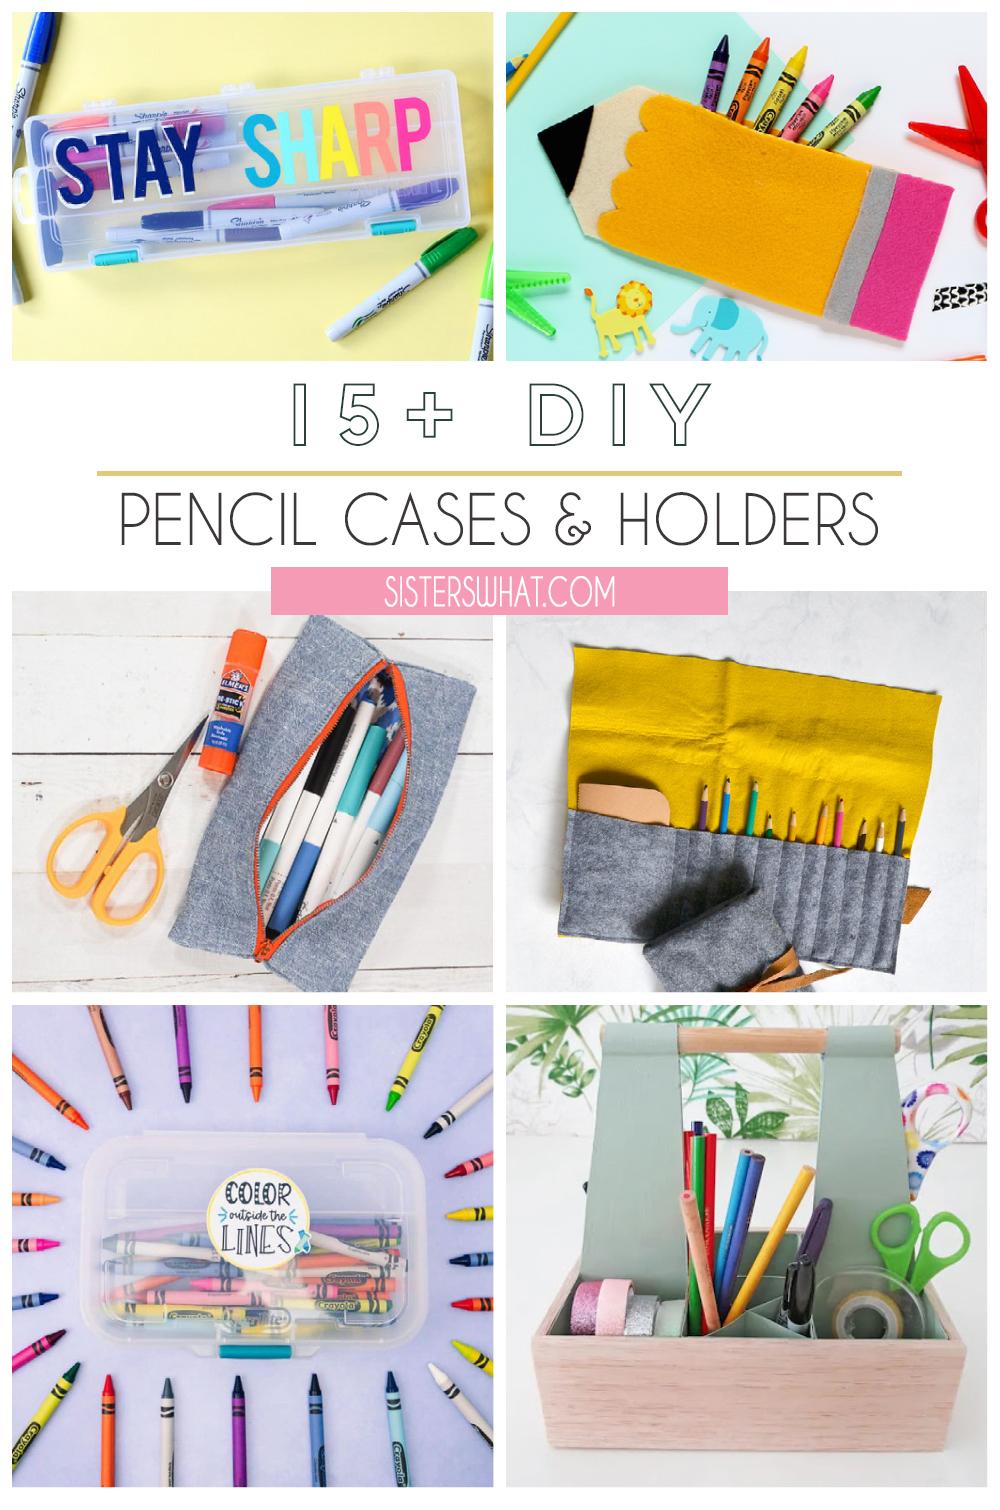 DIY pencil cases you can make easy